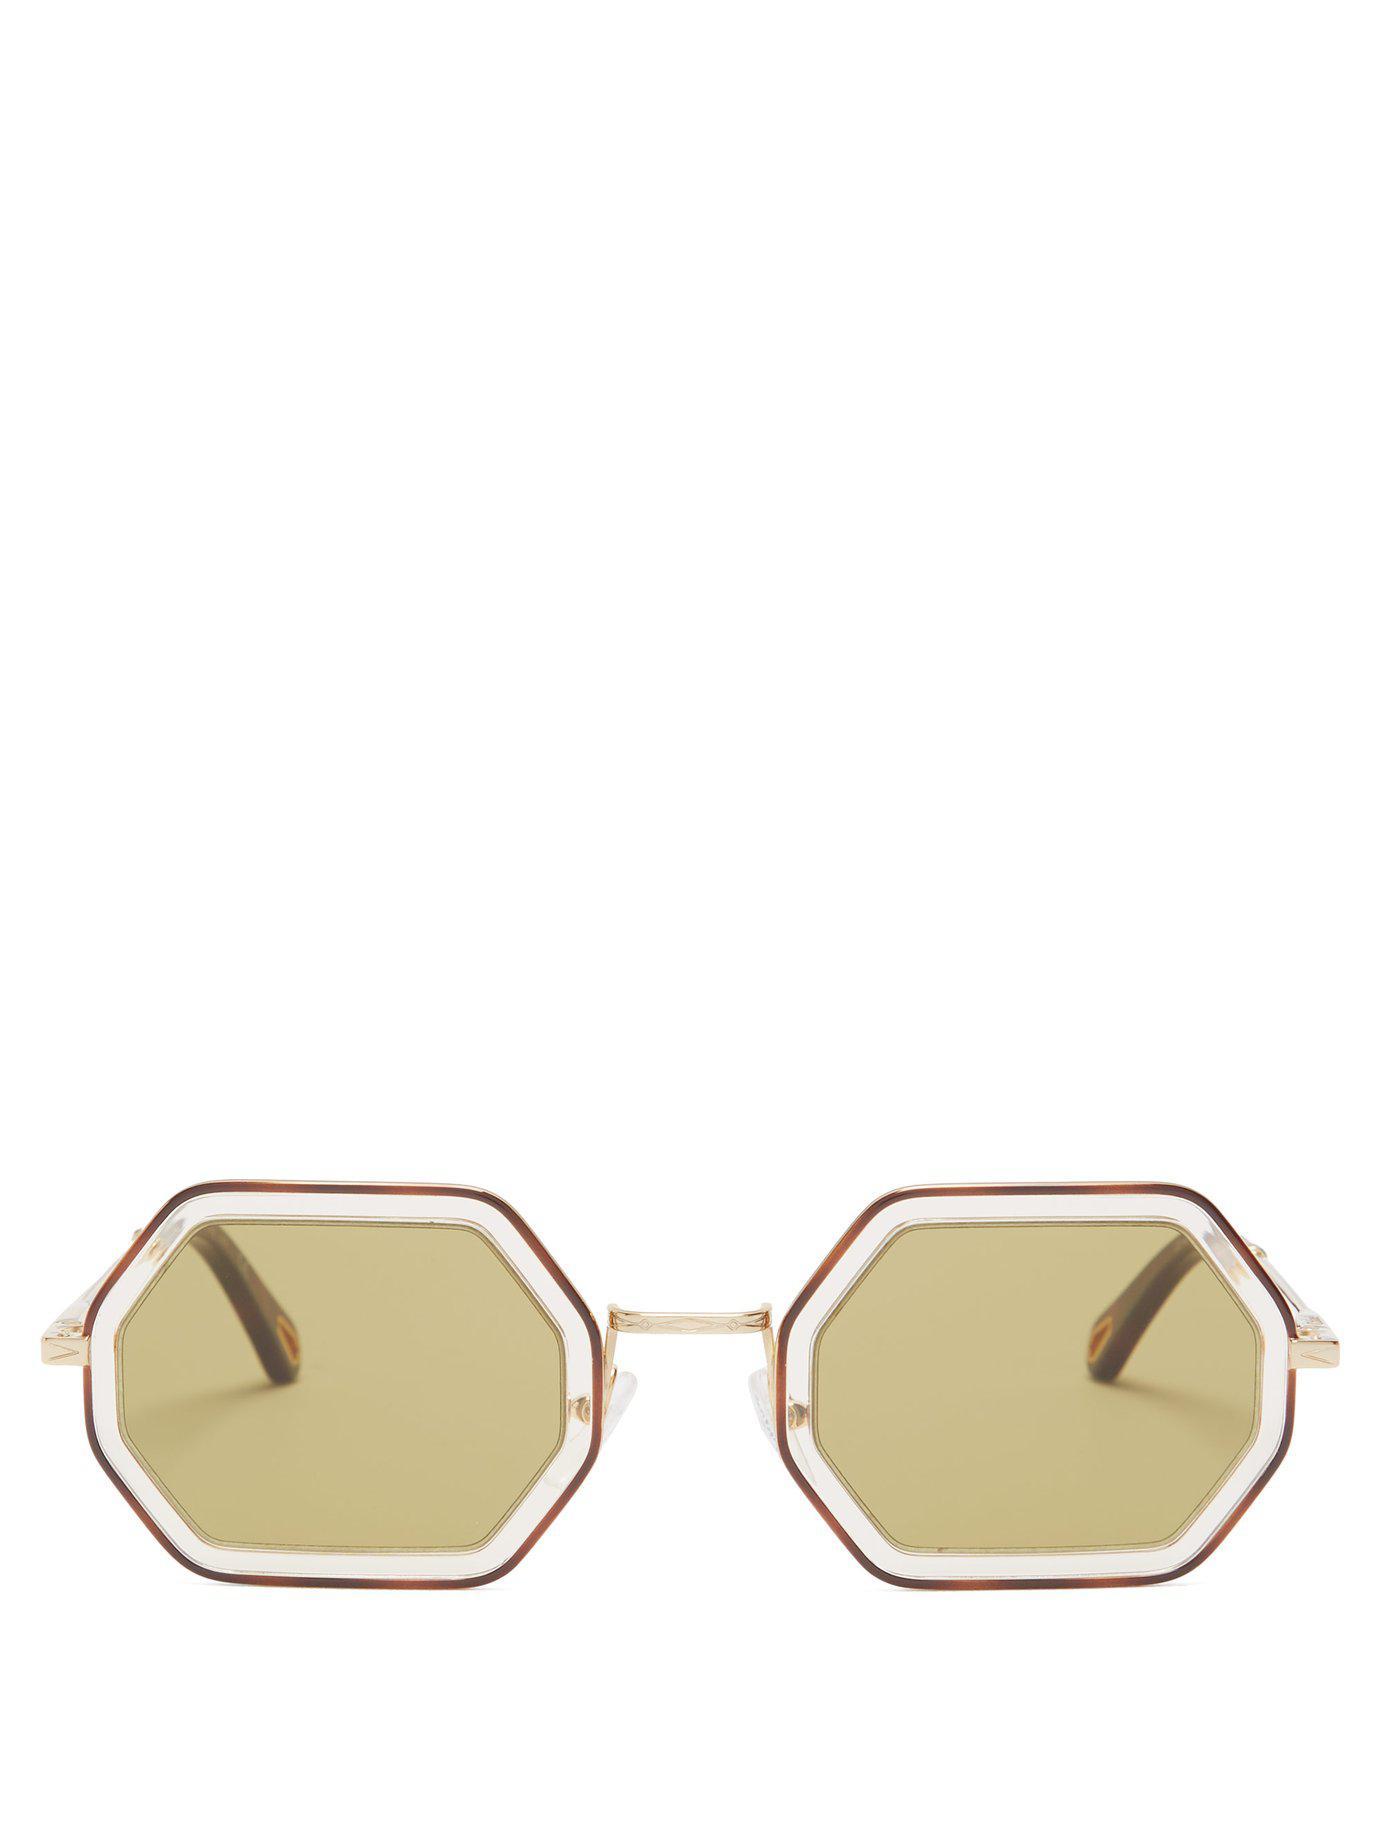 9582b2a3c93 Lyst - Chloé Tally Hexagon Frame Sunglasses in Green